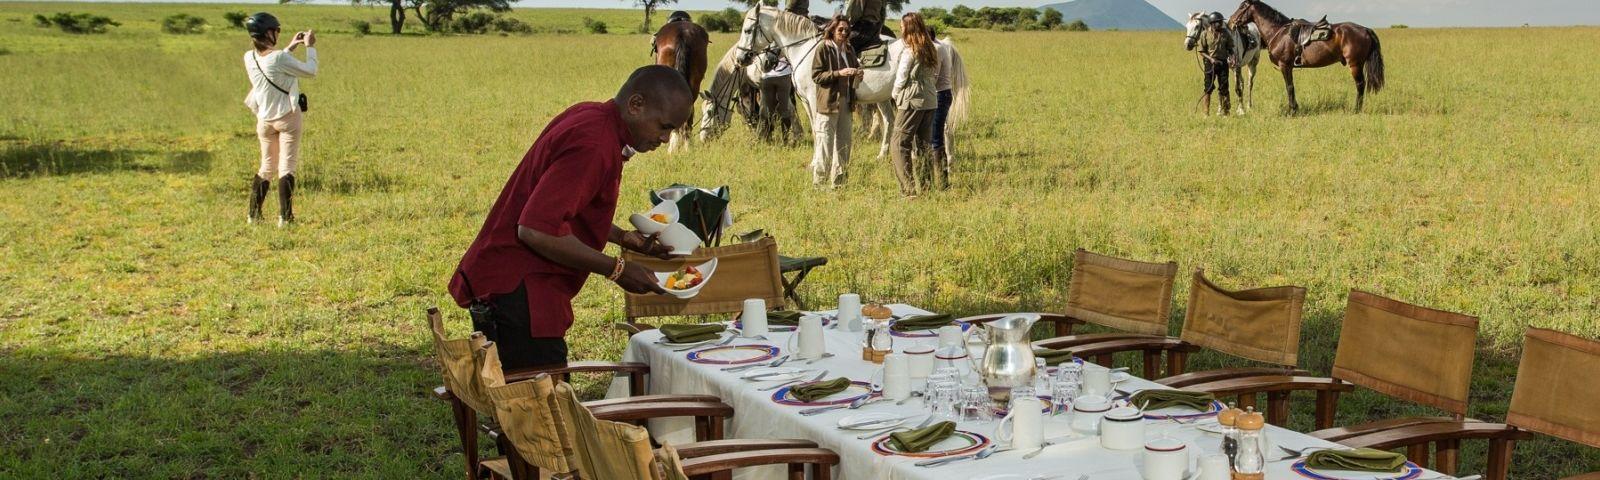 Breakfast at hotel Ol Donyo Lodge in Chyulu Hills, Kenya